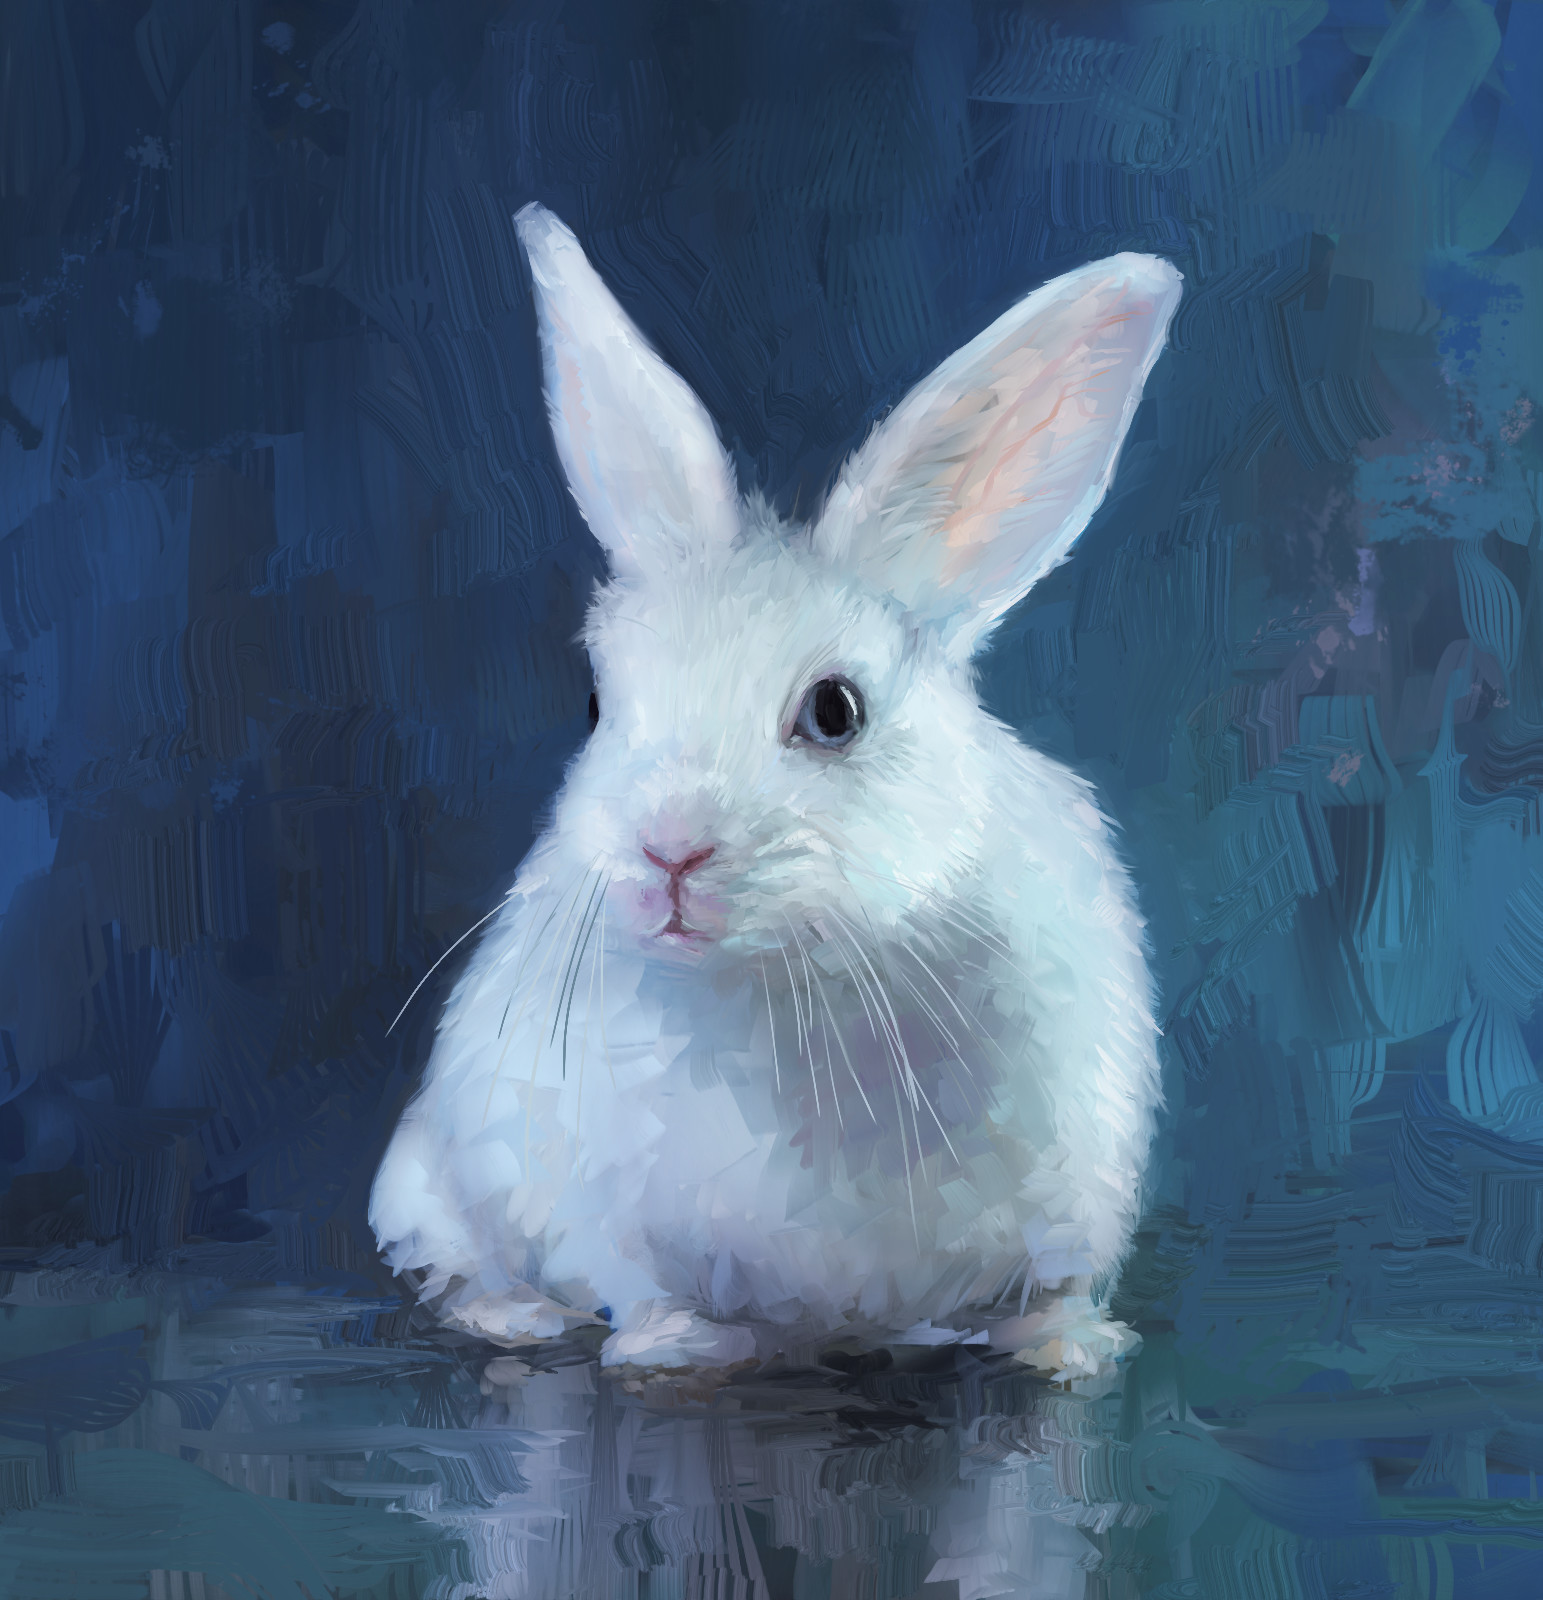 Mj venegas spadafora bunny portrait2final